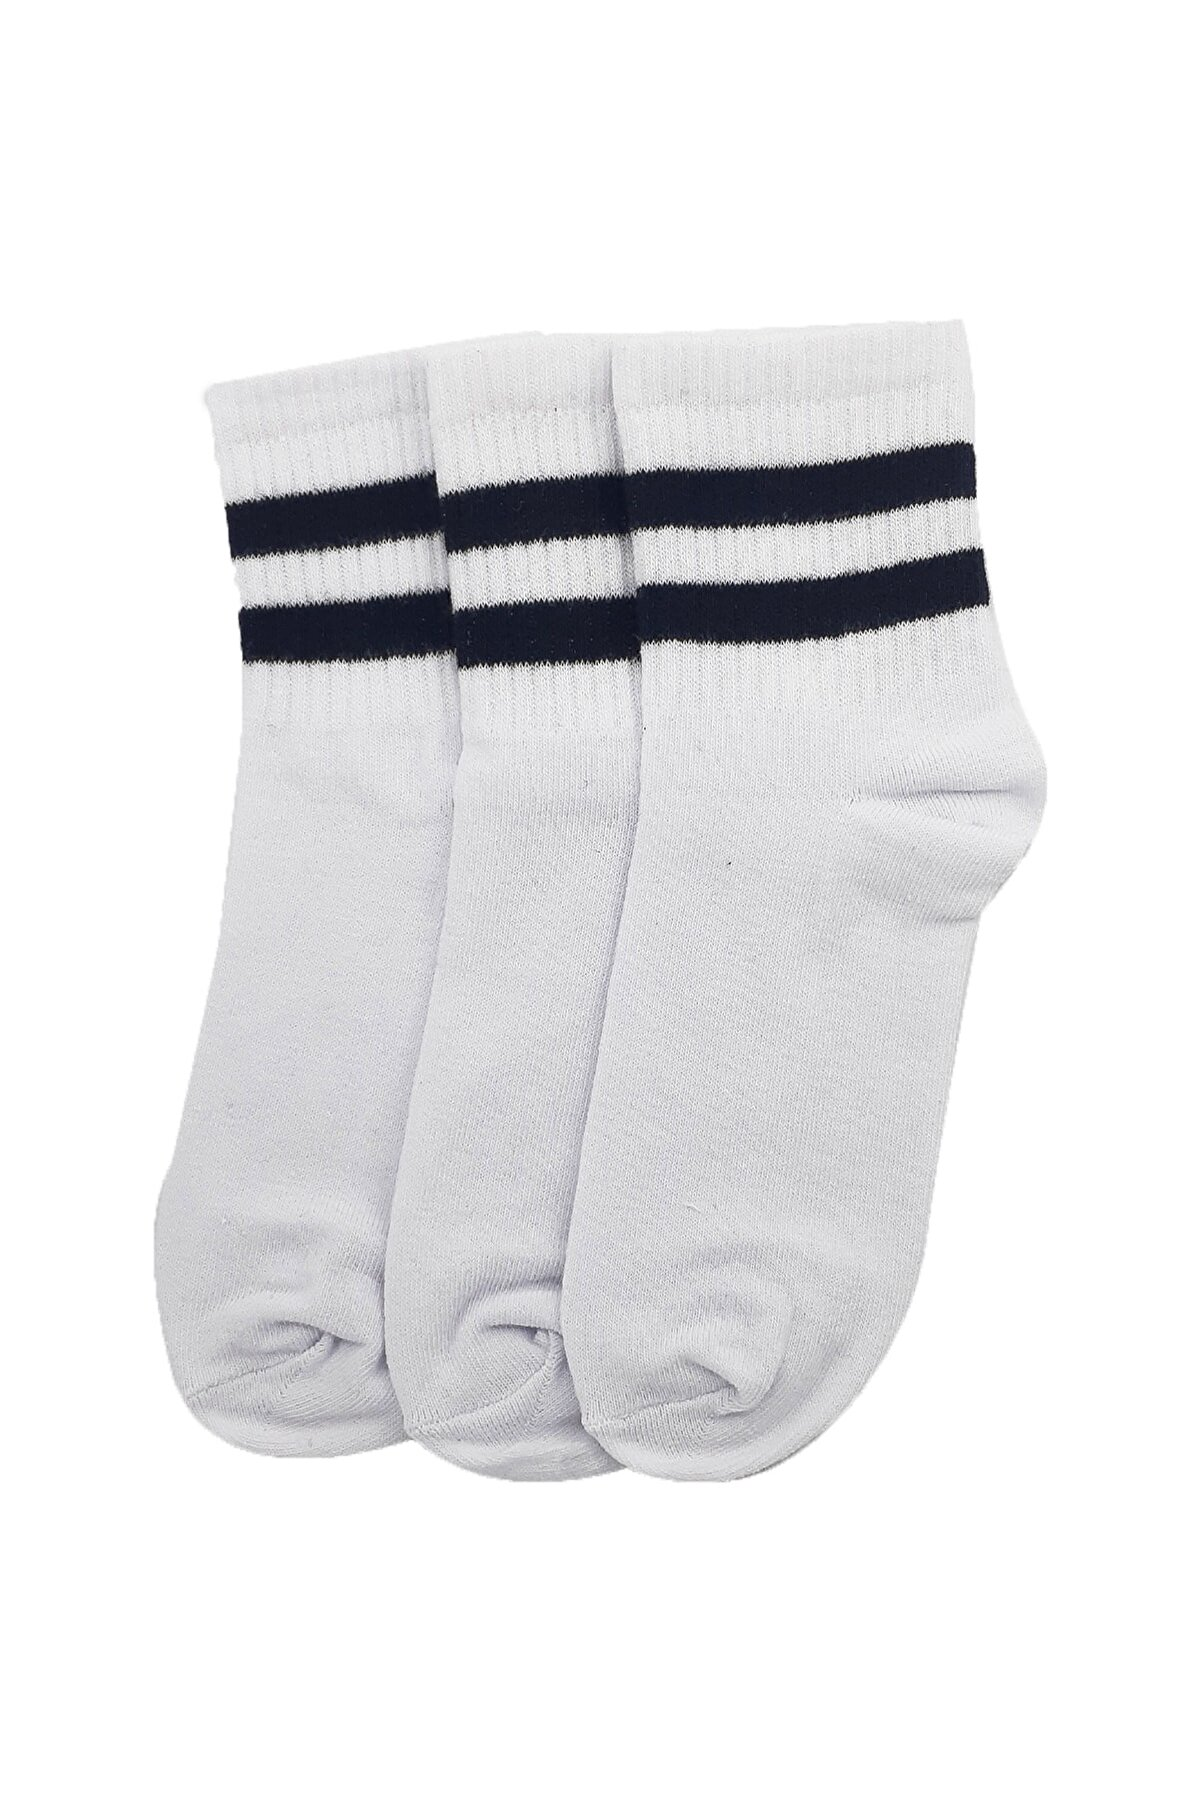 Shaka Beyaz No:11 3'lü Soket Unisex Kolej Çorap